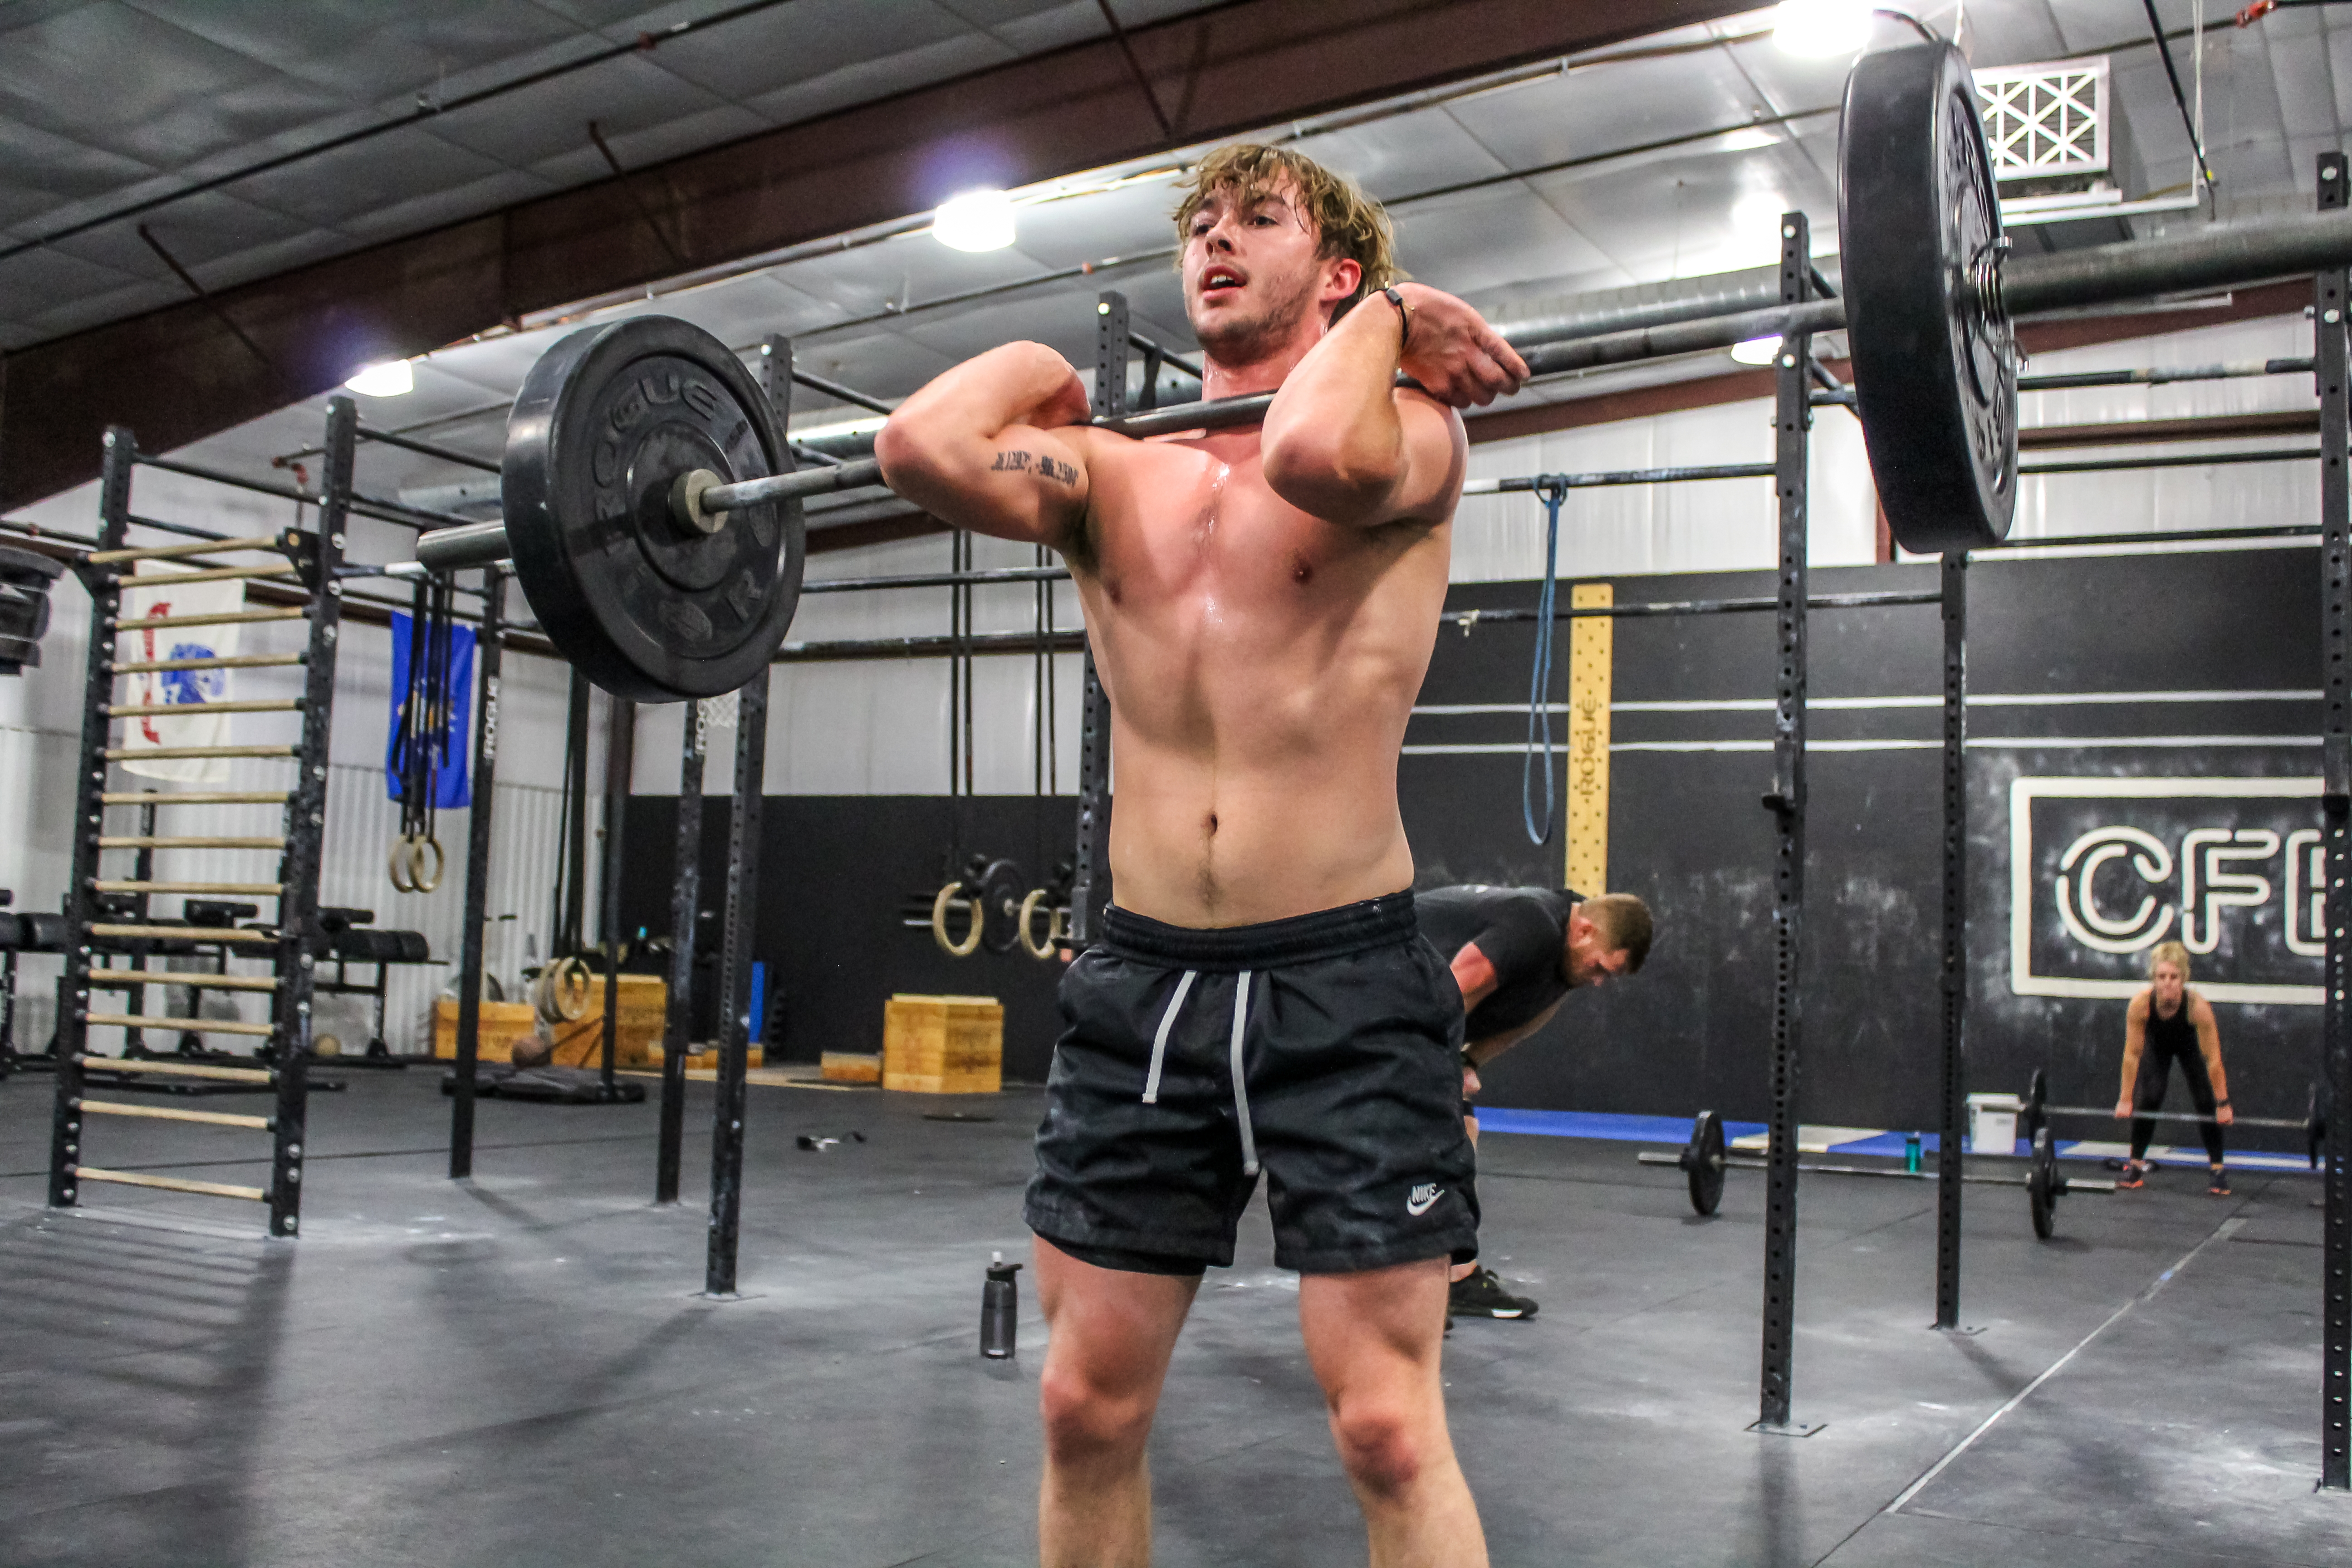 athlete image